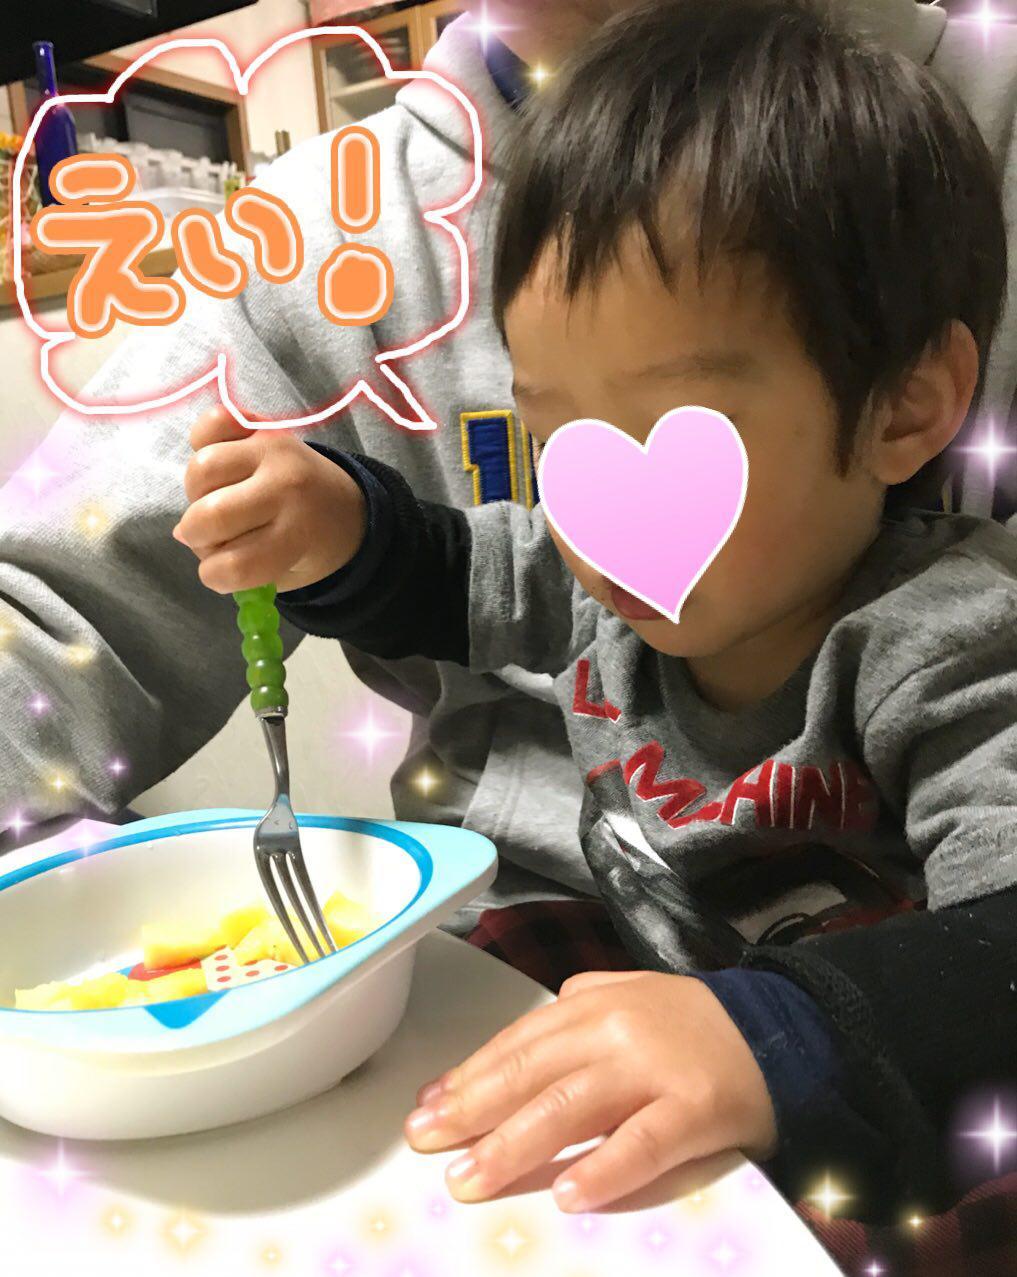 photo_2018-03-18_22-34-21.jpg